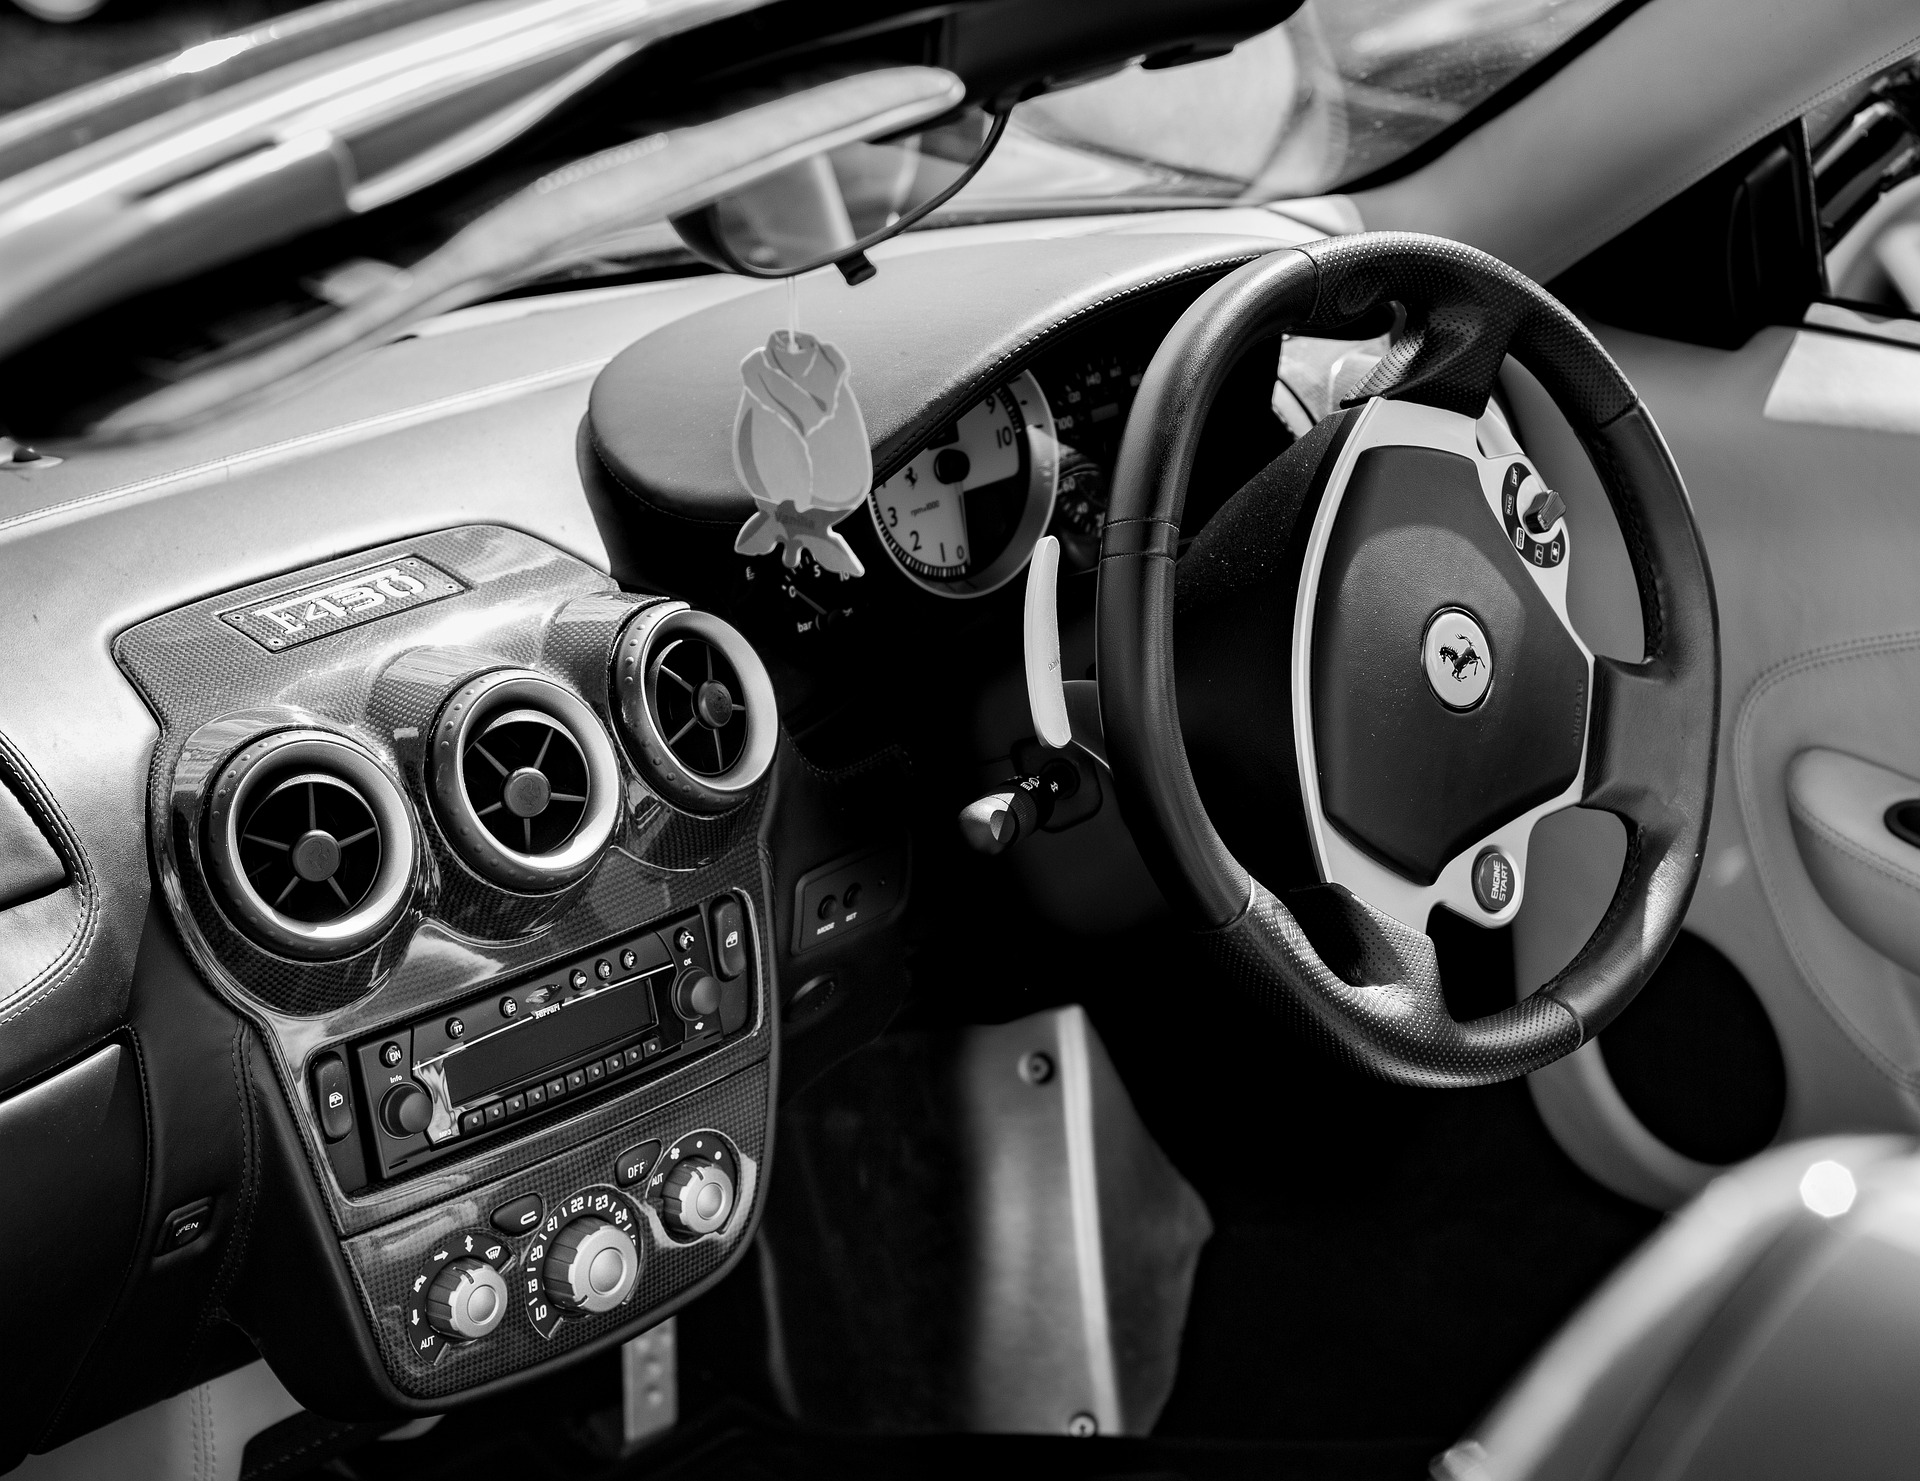 Ferrari F430 F1 Spider 2005